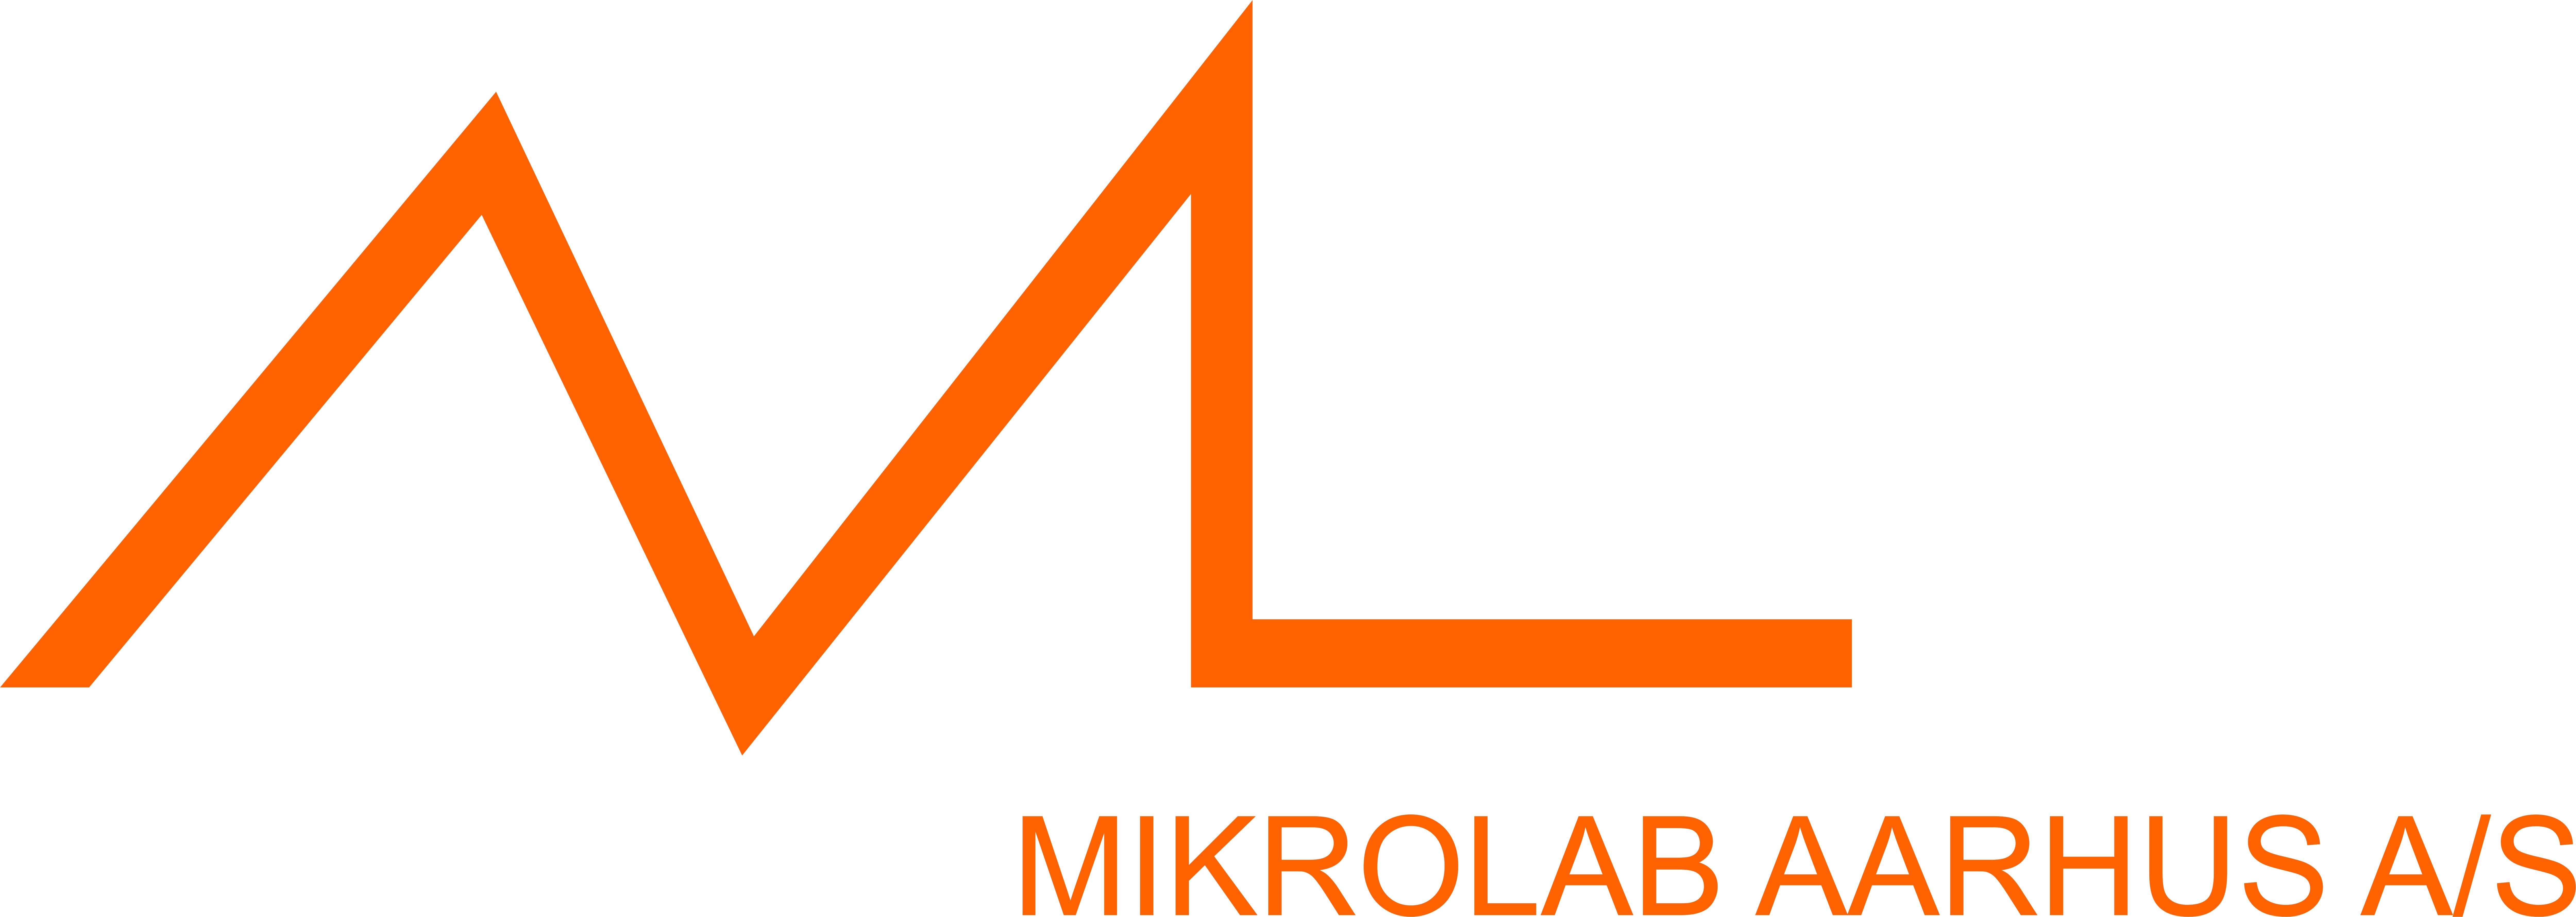 Mikrolab